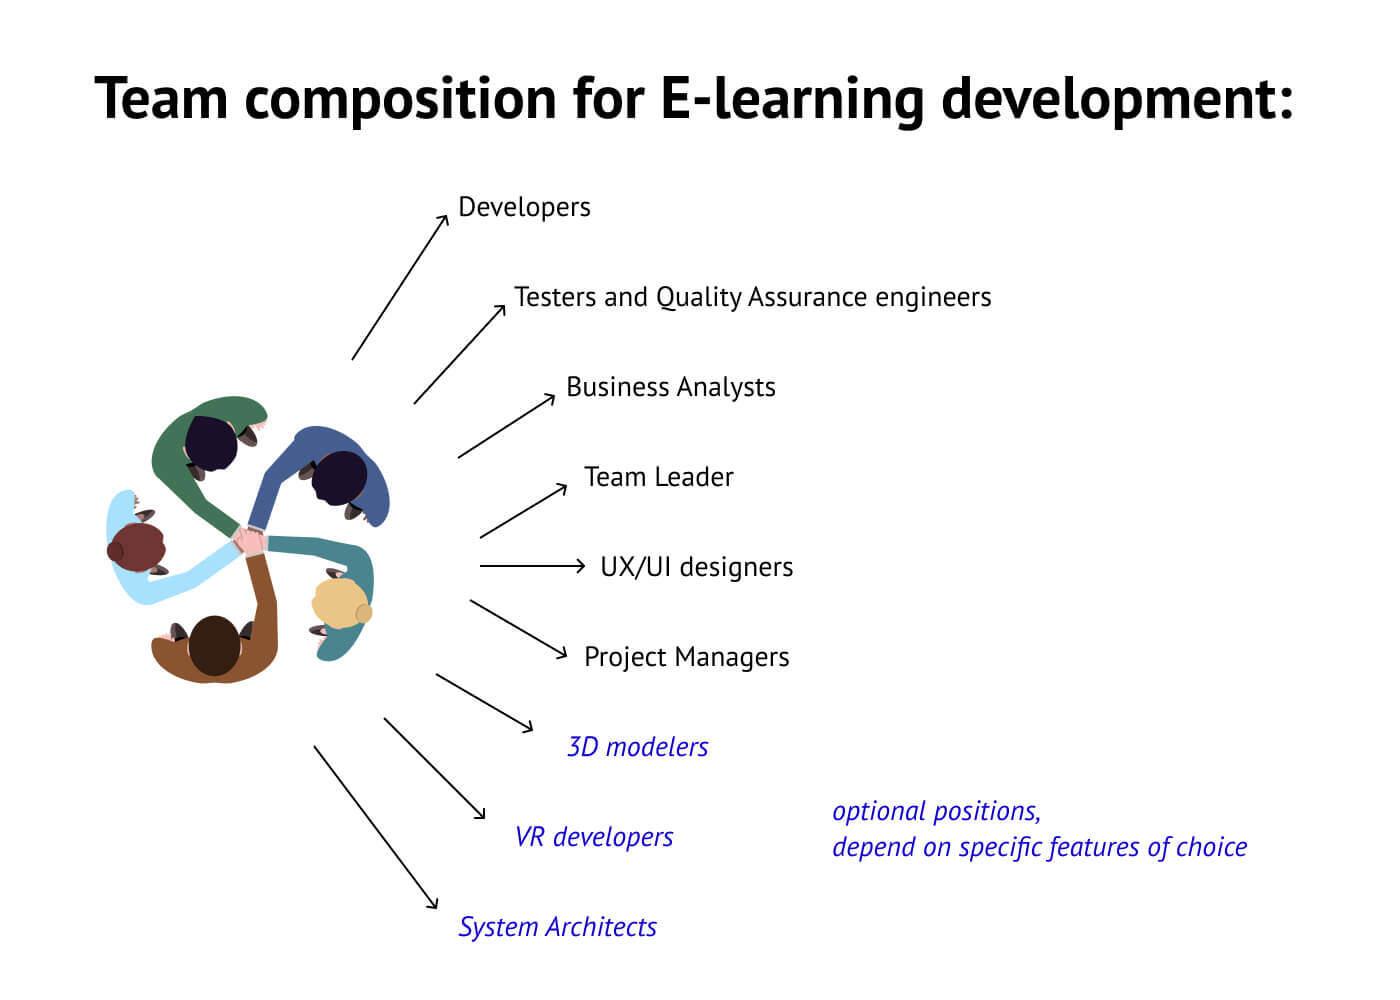 Team composition for e-learning development